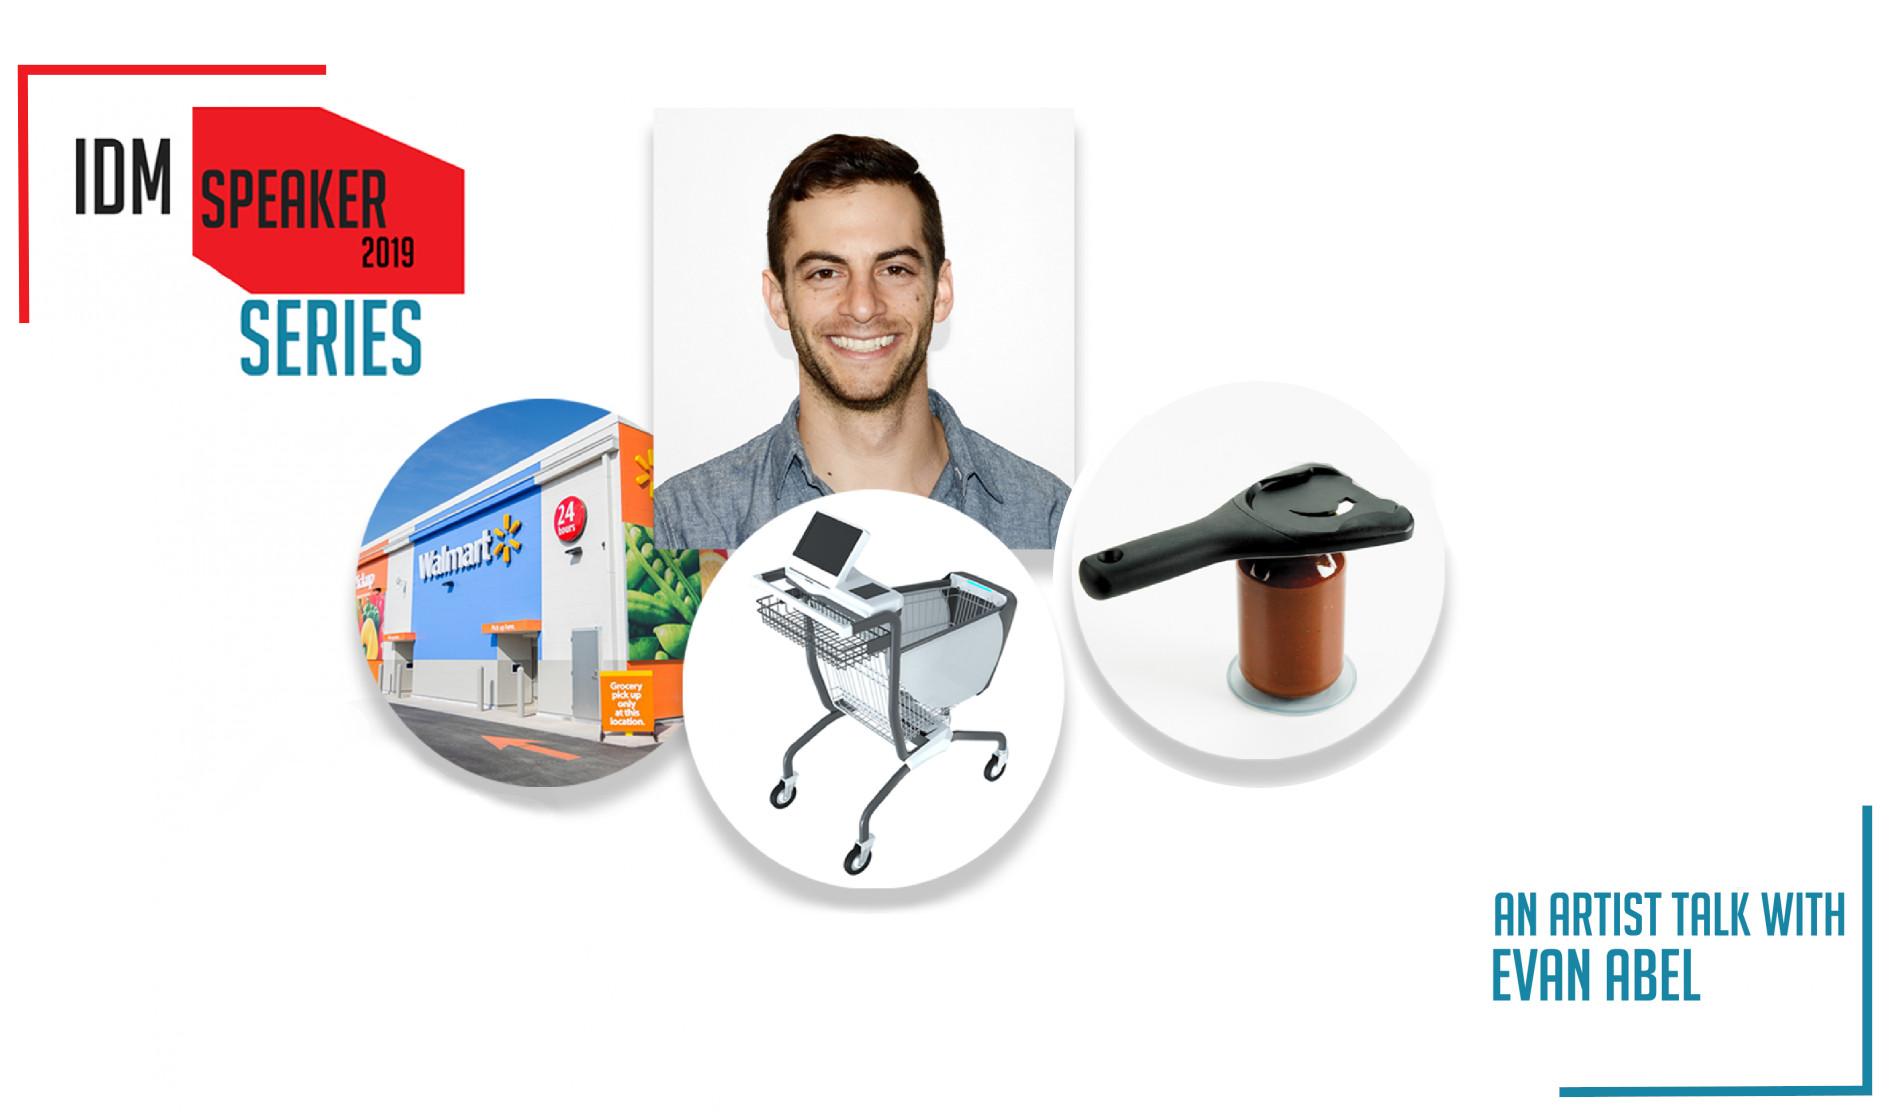 Walmart Innovation Tech Product Manager Evan Abel Speaks @ the IDM Speaker Series